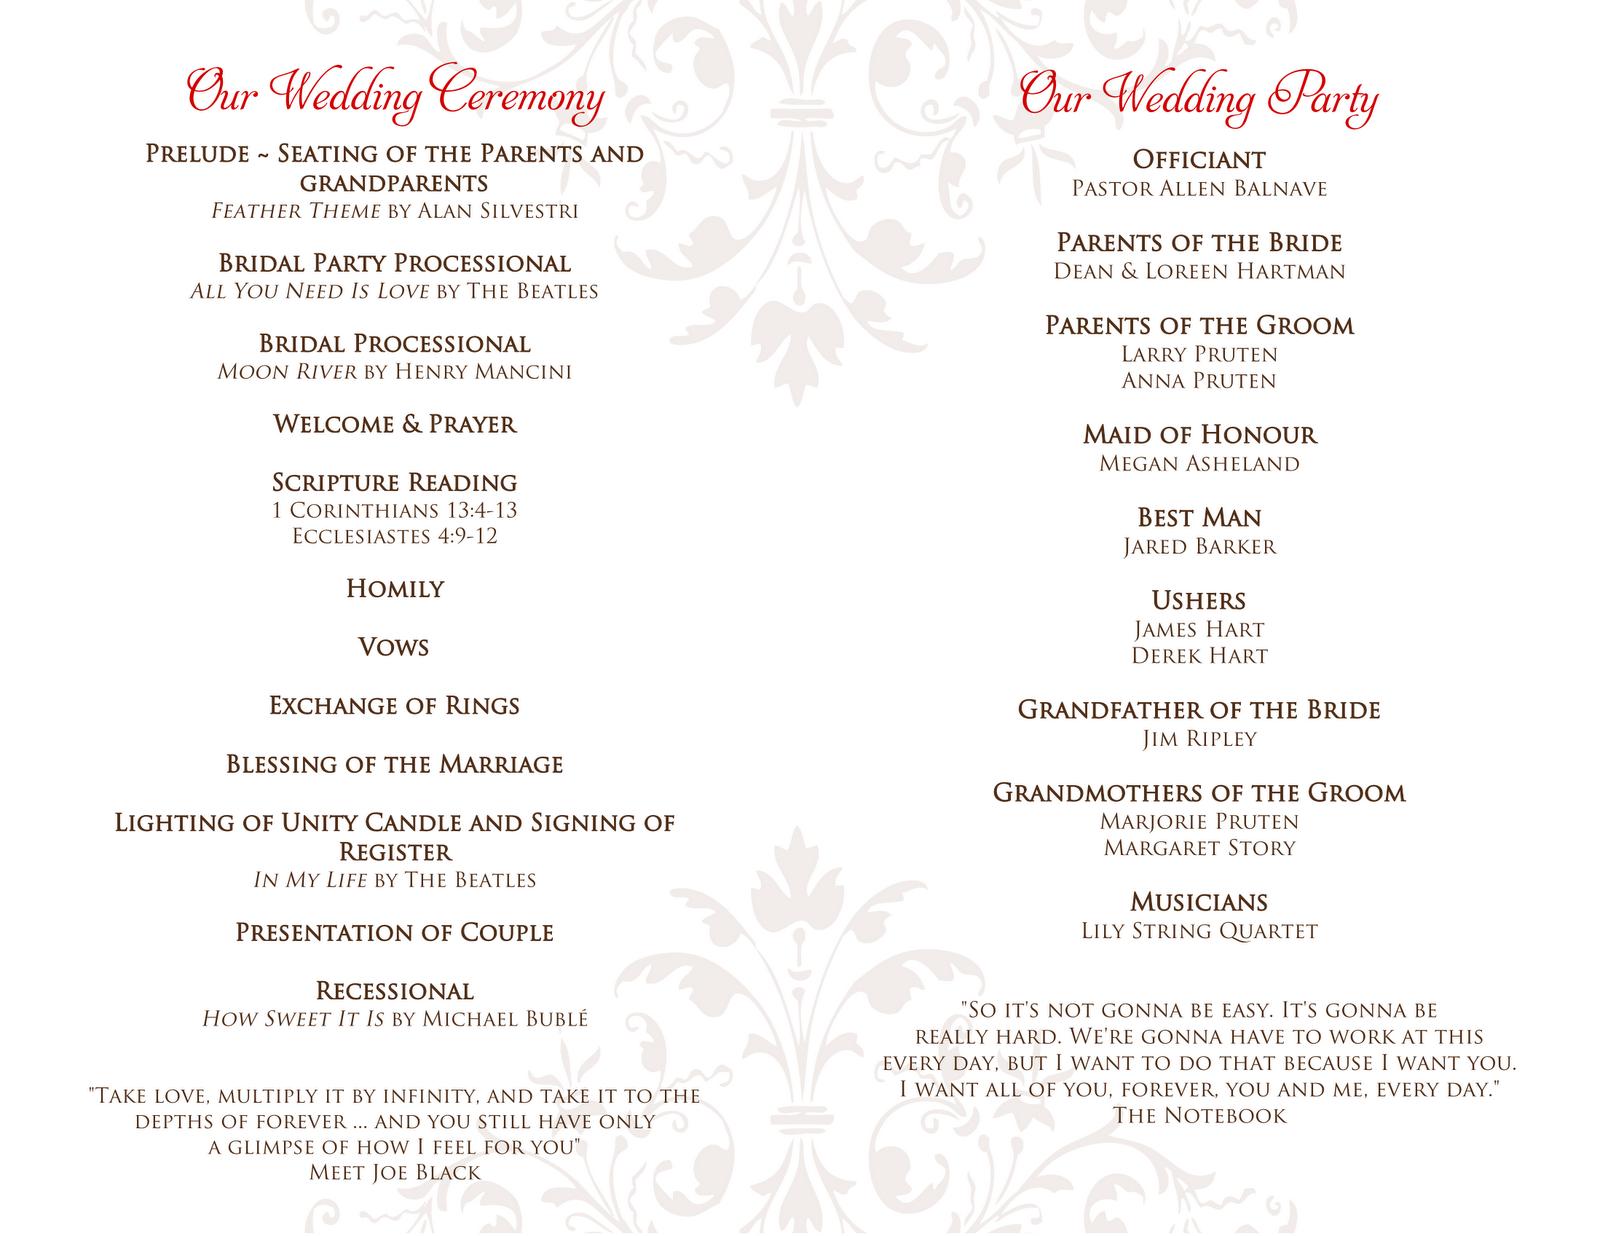 wedding programs wedding programs Signatures by Sarah Wedding programs for Amanda